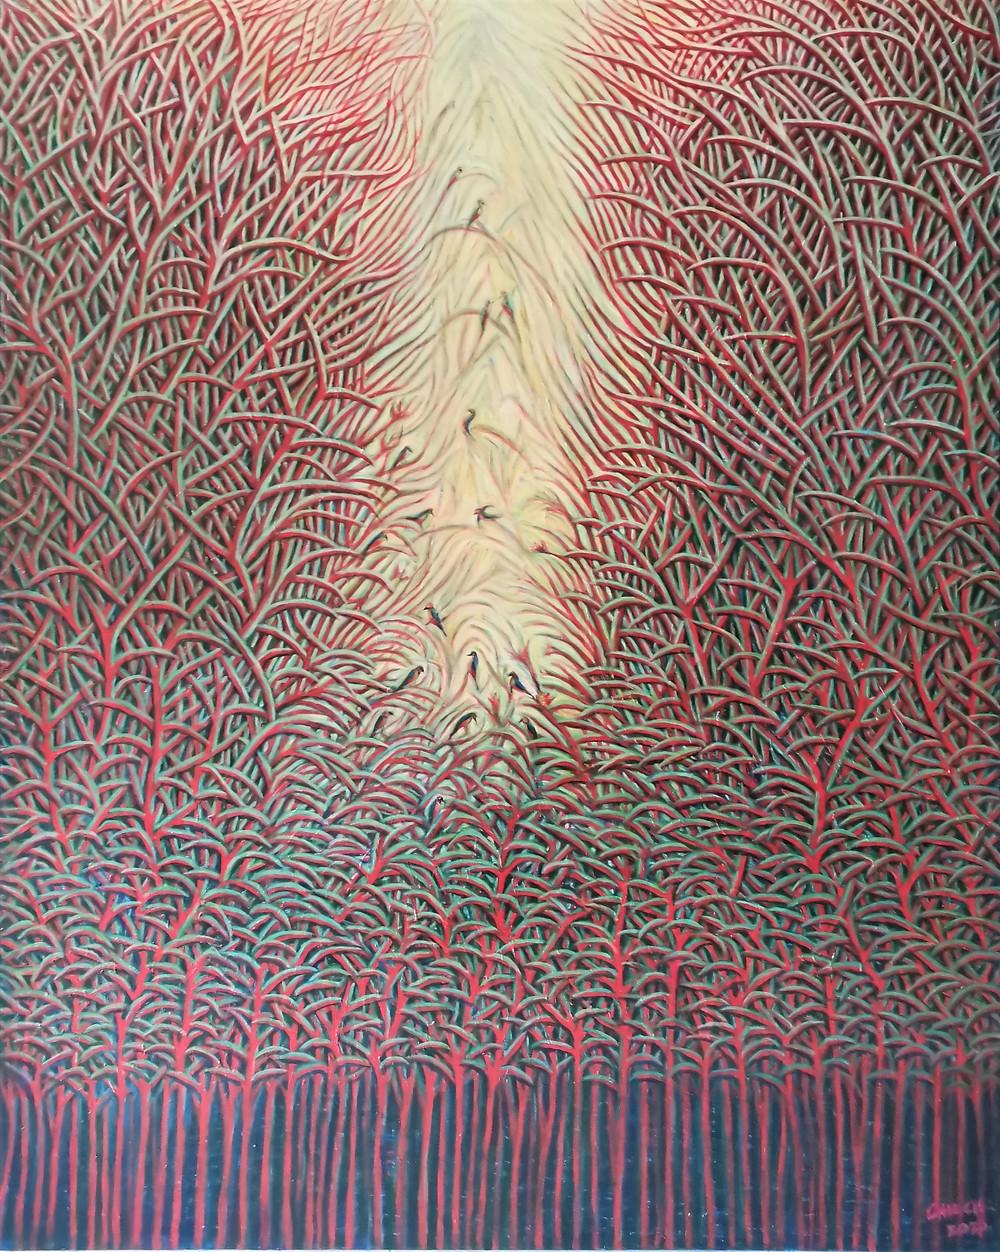 Art Herald Magazine, The Collector's Award, Studio-ID Art Gallery, Global Art Competition, Nidhi Samani, Deborah Henry-Pollard, Joan Marie Kelly, Gerald Tay, Chia Chor Hua